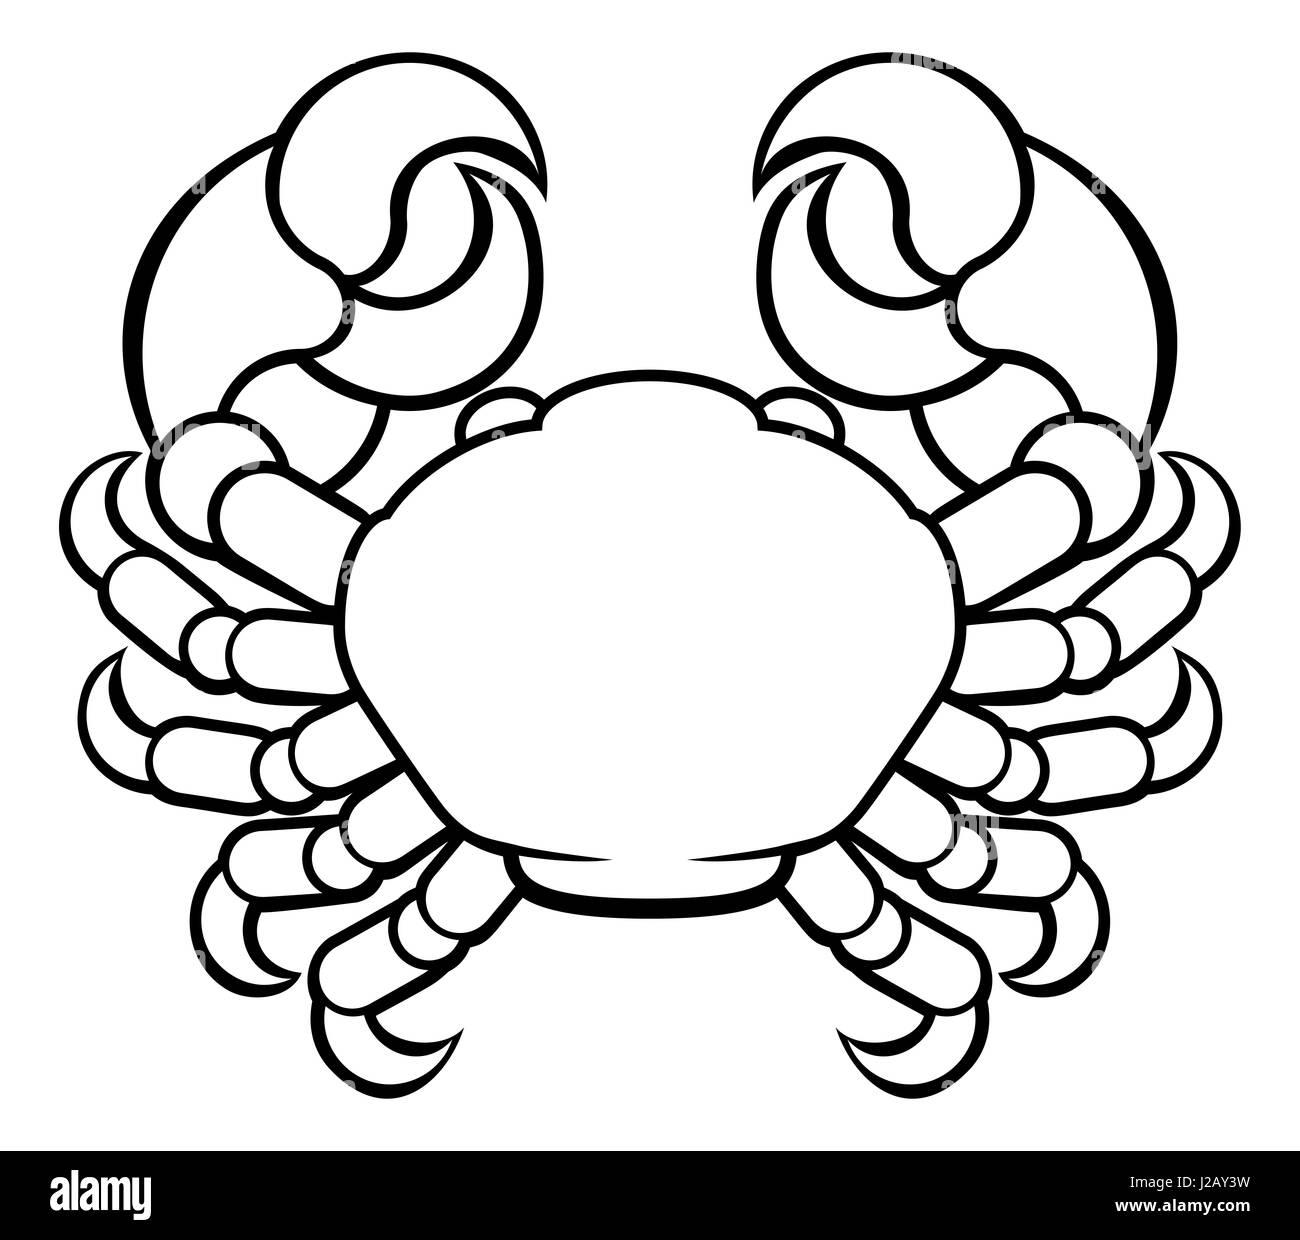 Astrology horoscope zodiac signs, circular Cancer crab symbol - Stock Image